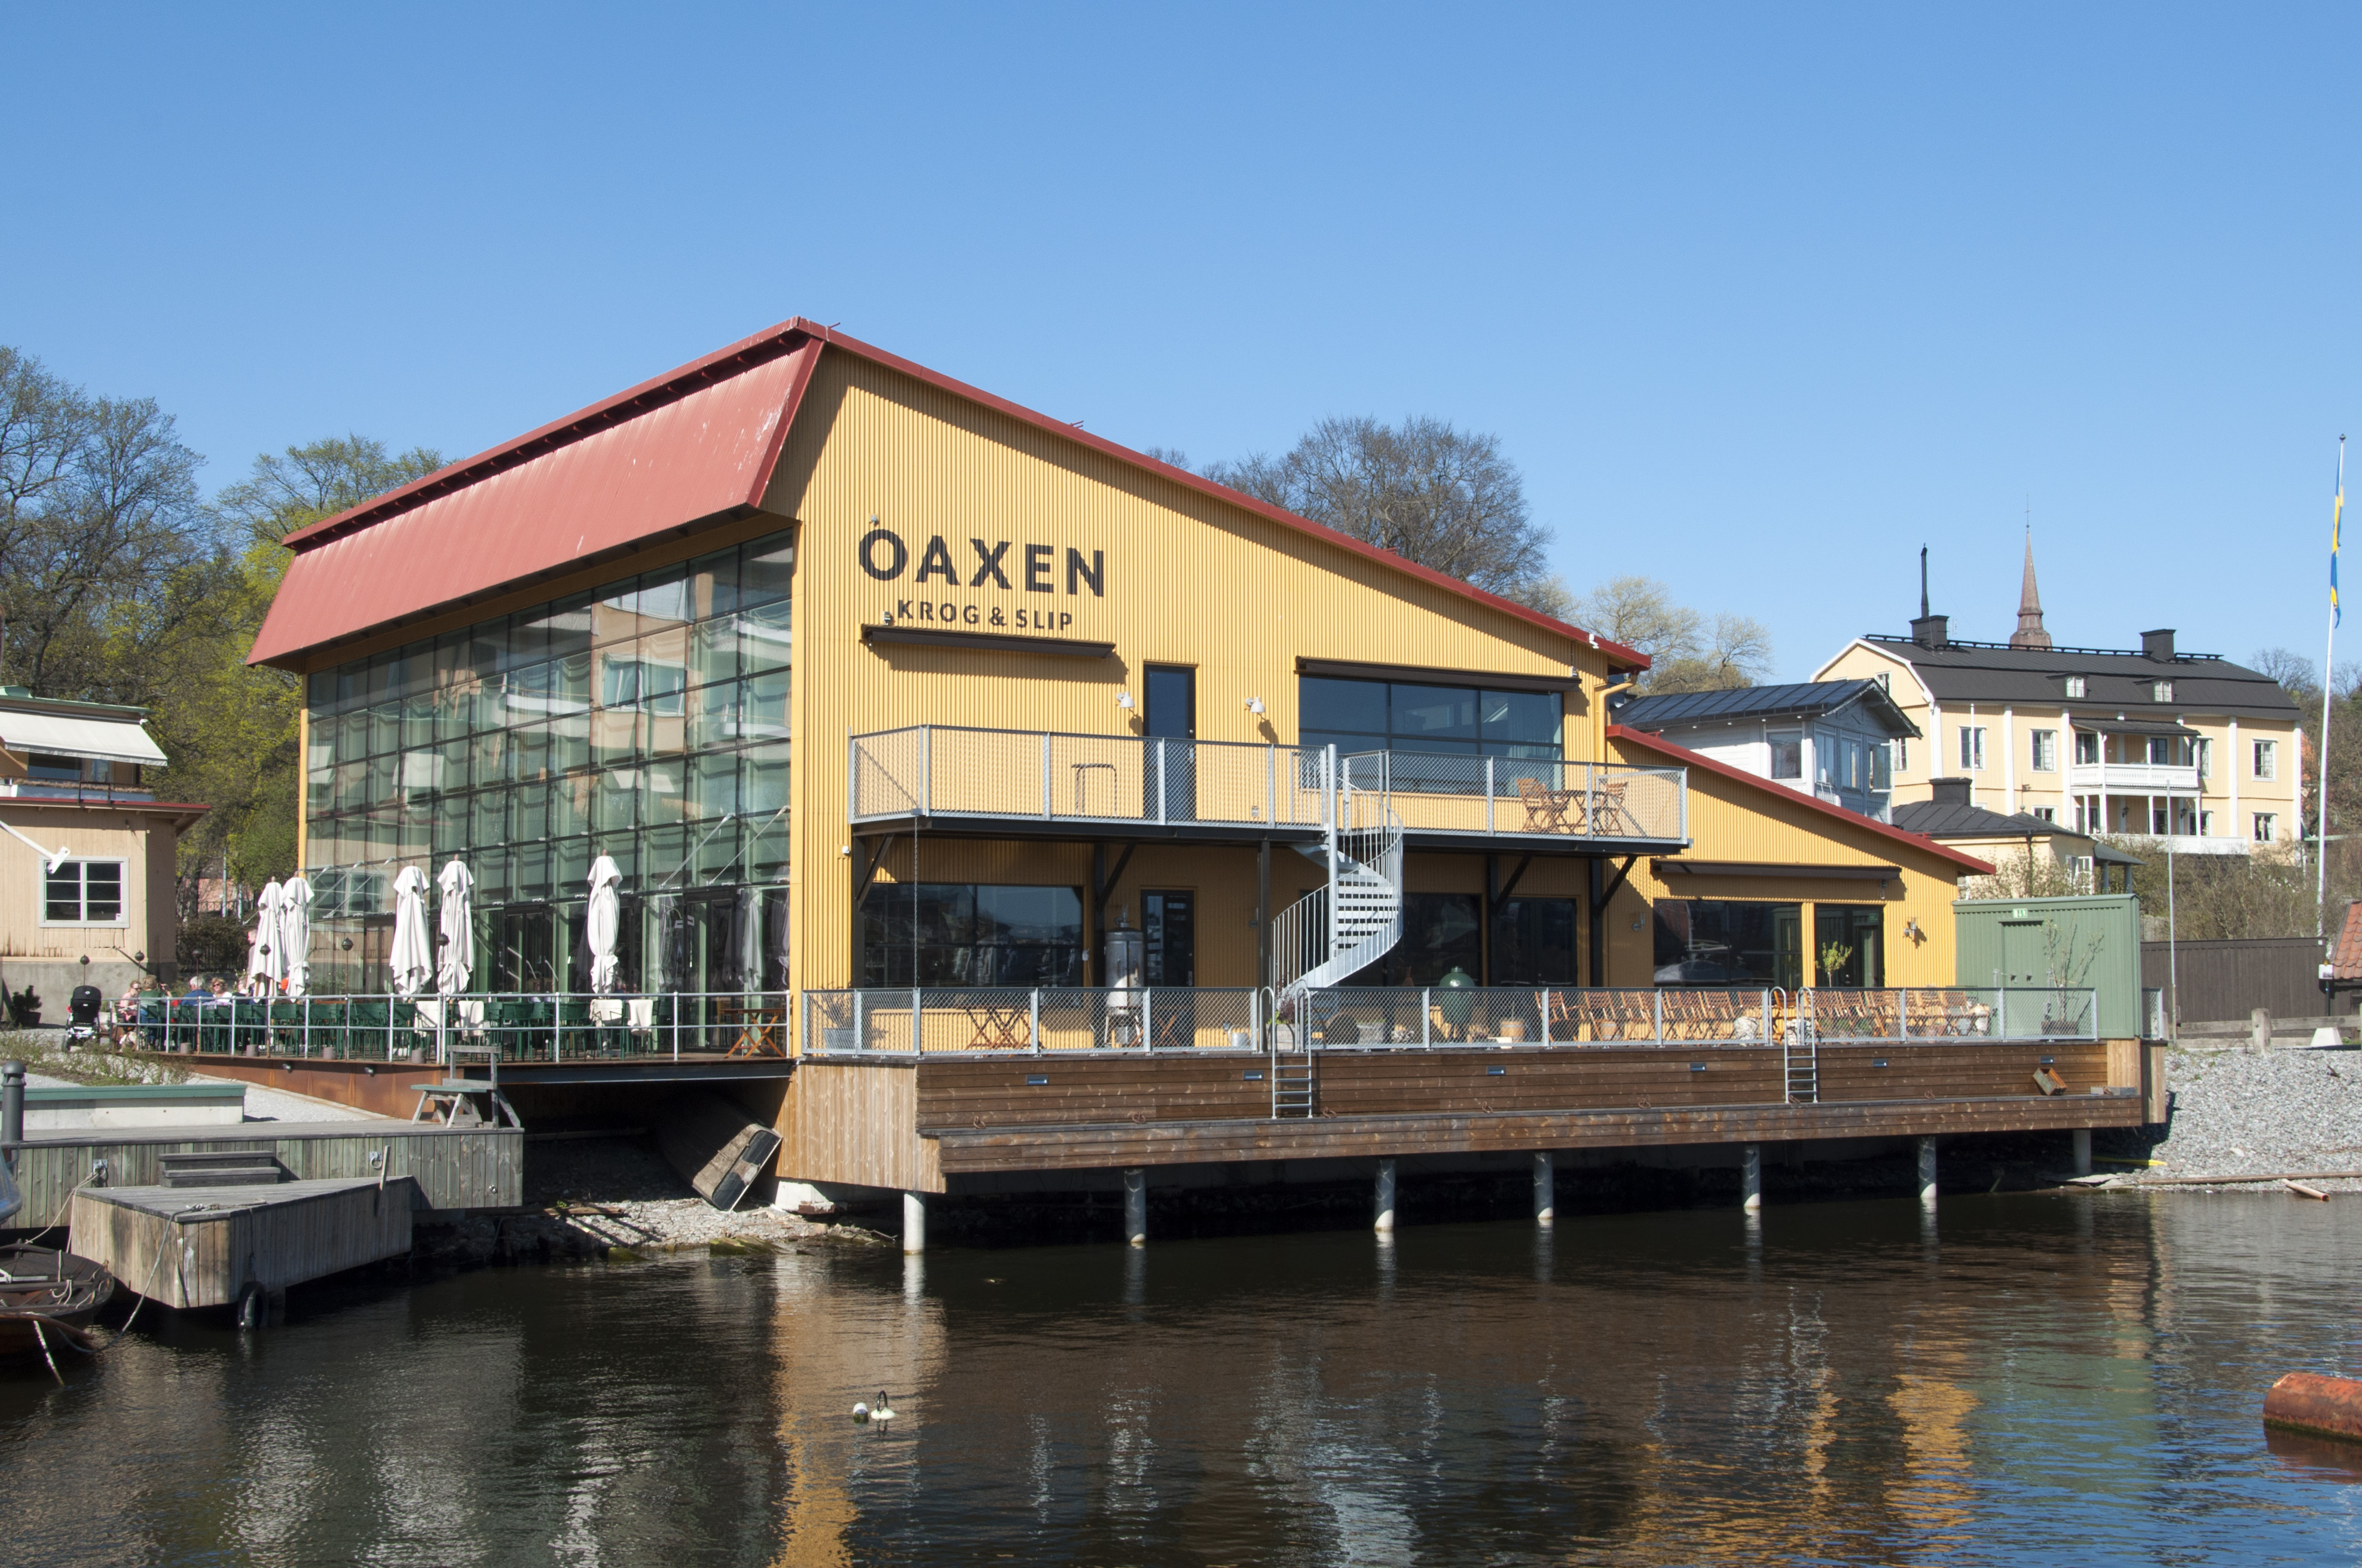 oaxen krog & slip stockholm